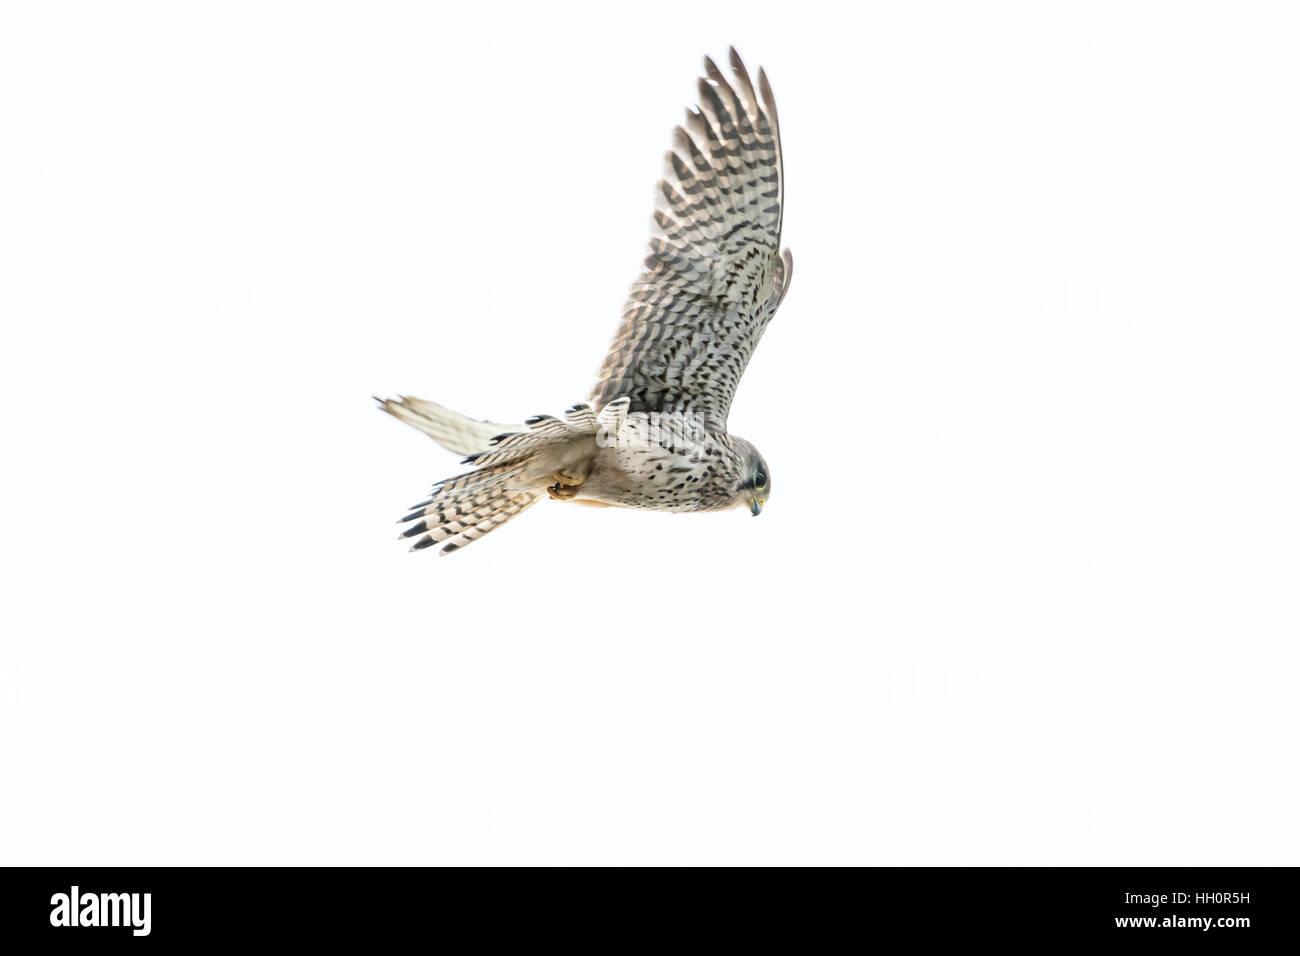 Female common kestrel (Falco tinnunculus) in flight against a white background - Stock Image